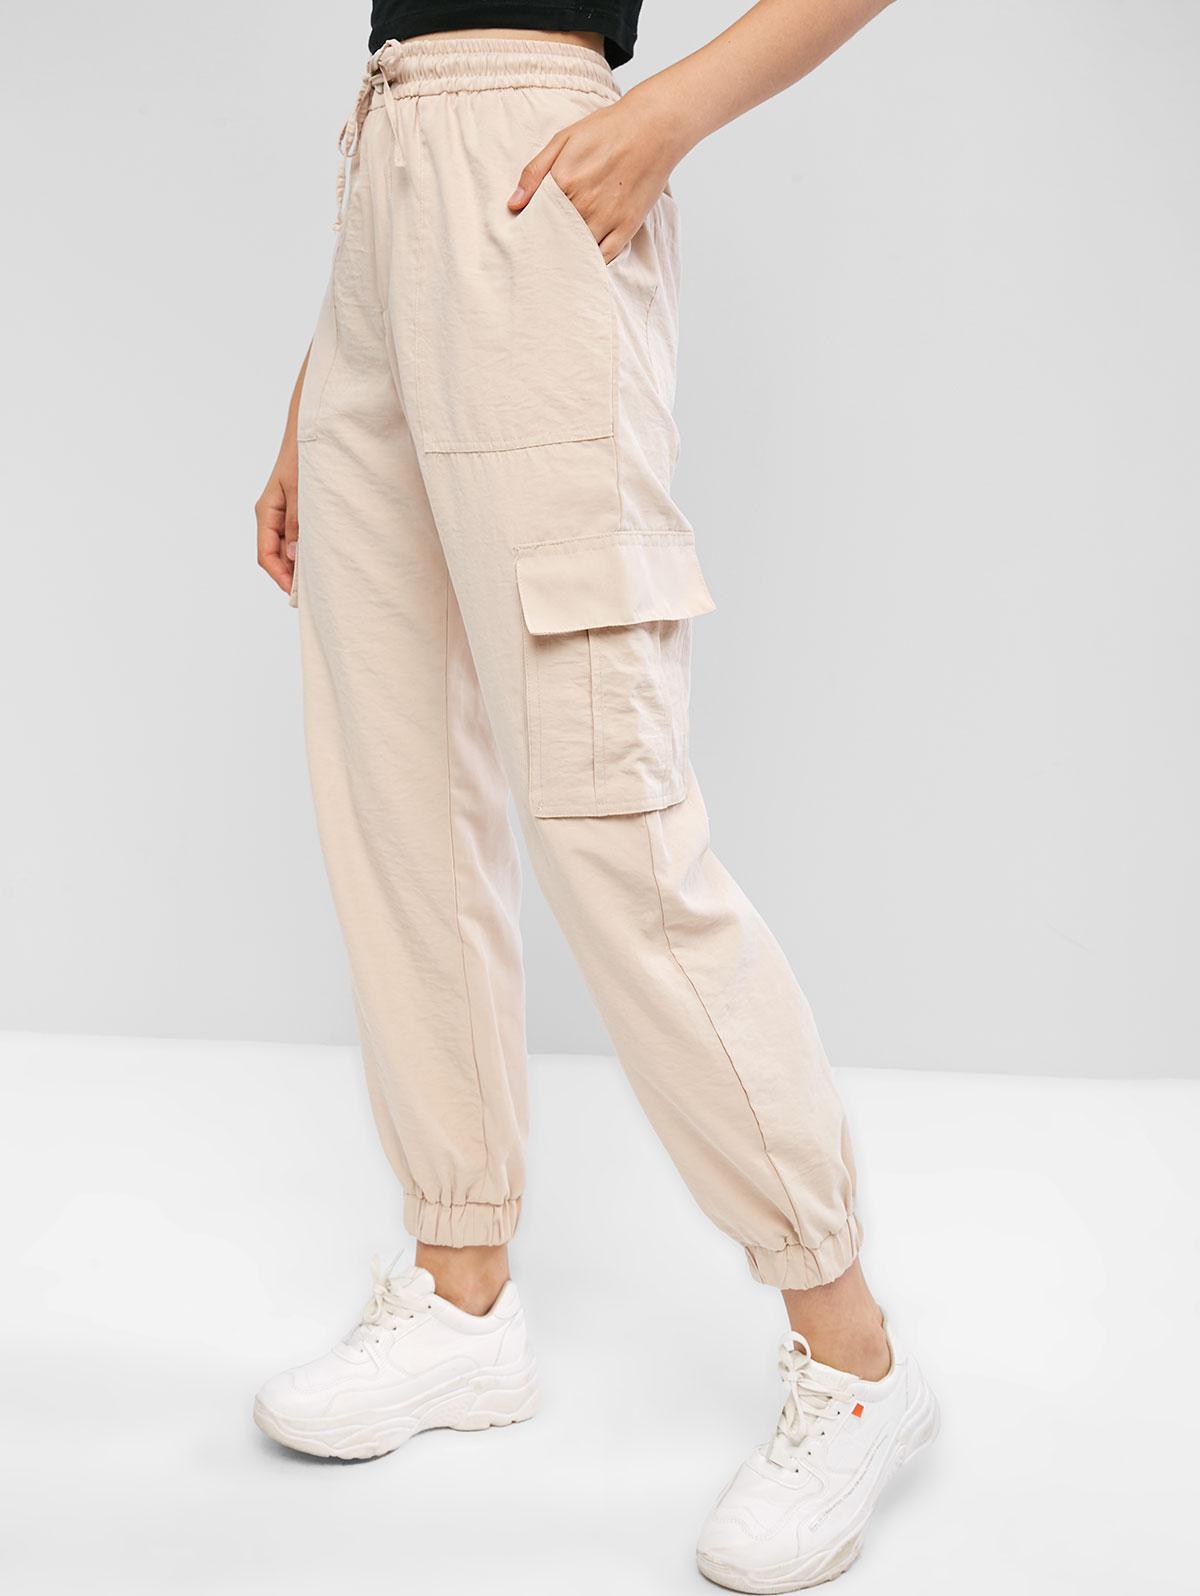 High Waisted Flap Pockets Jogger Pants, Tan